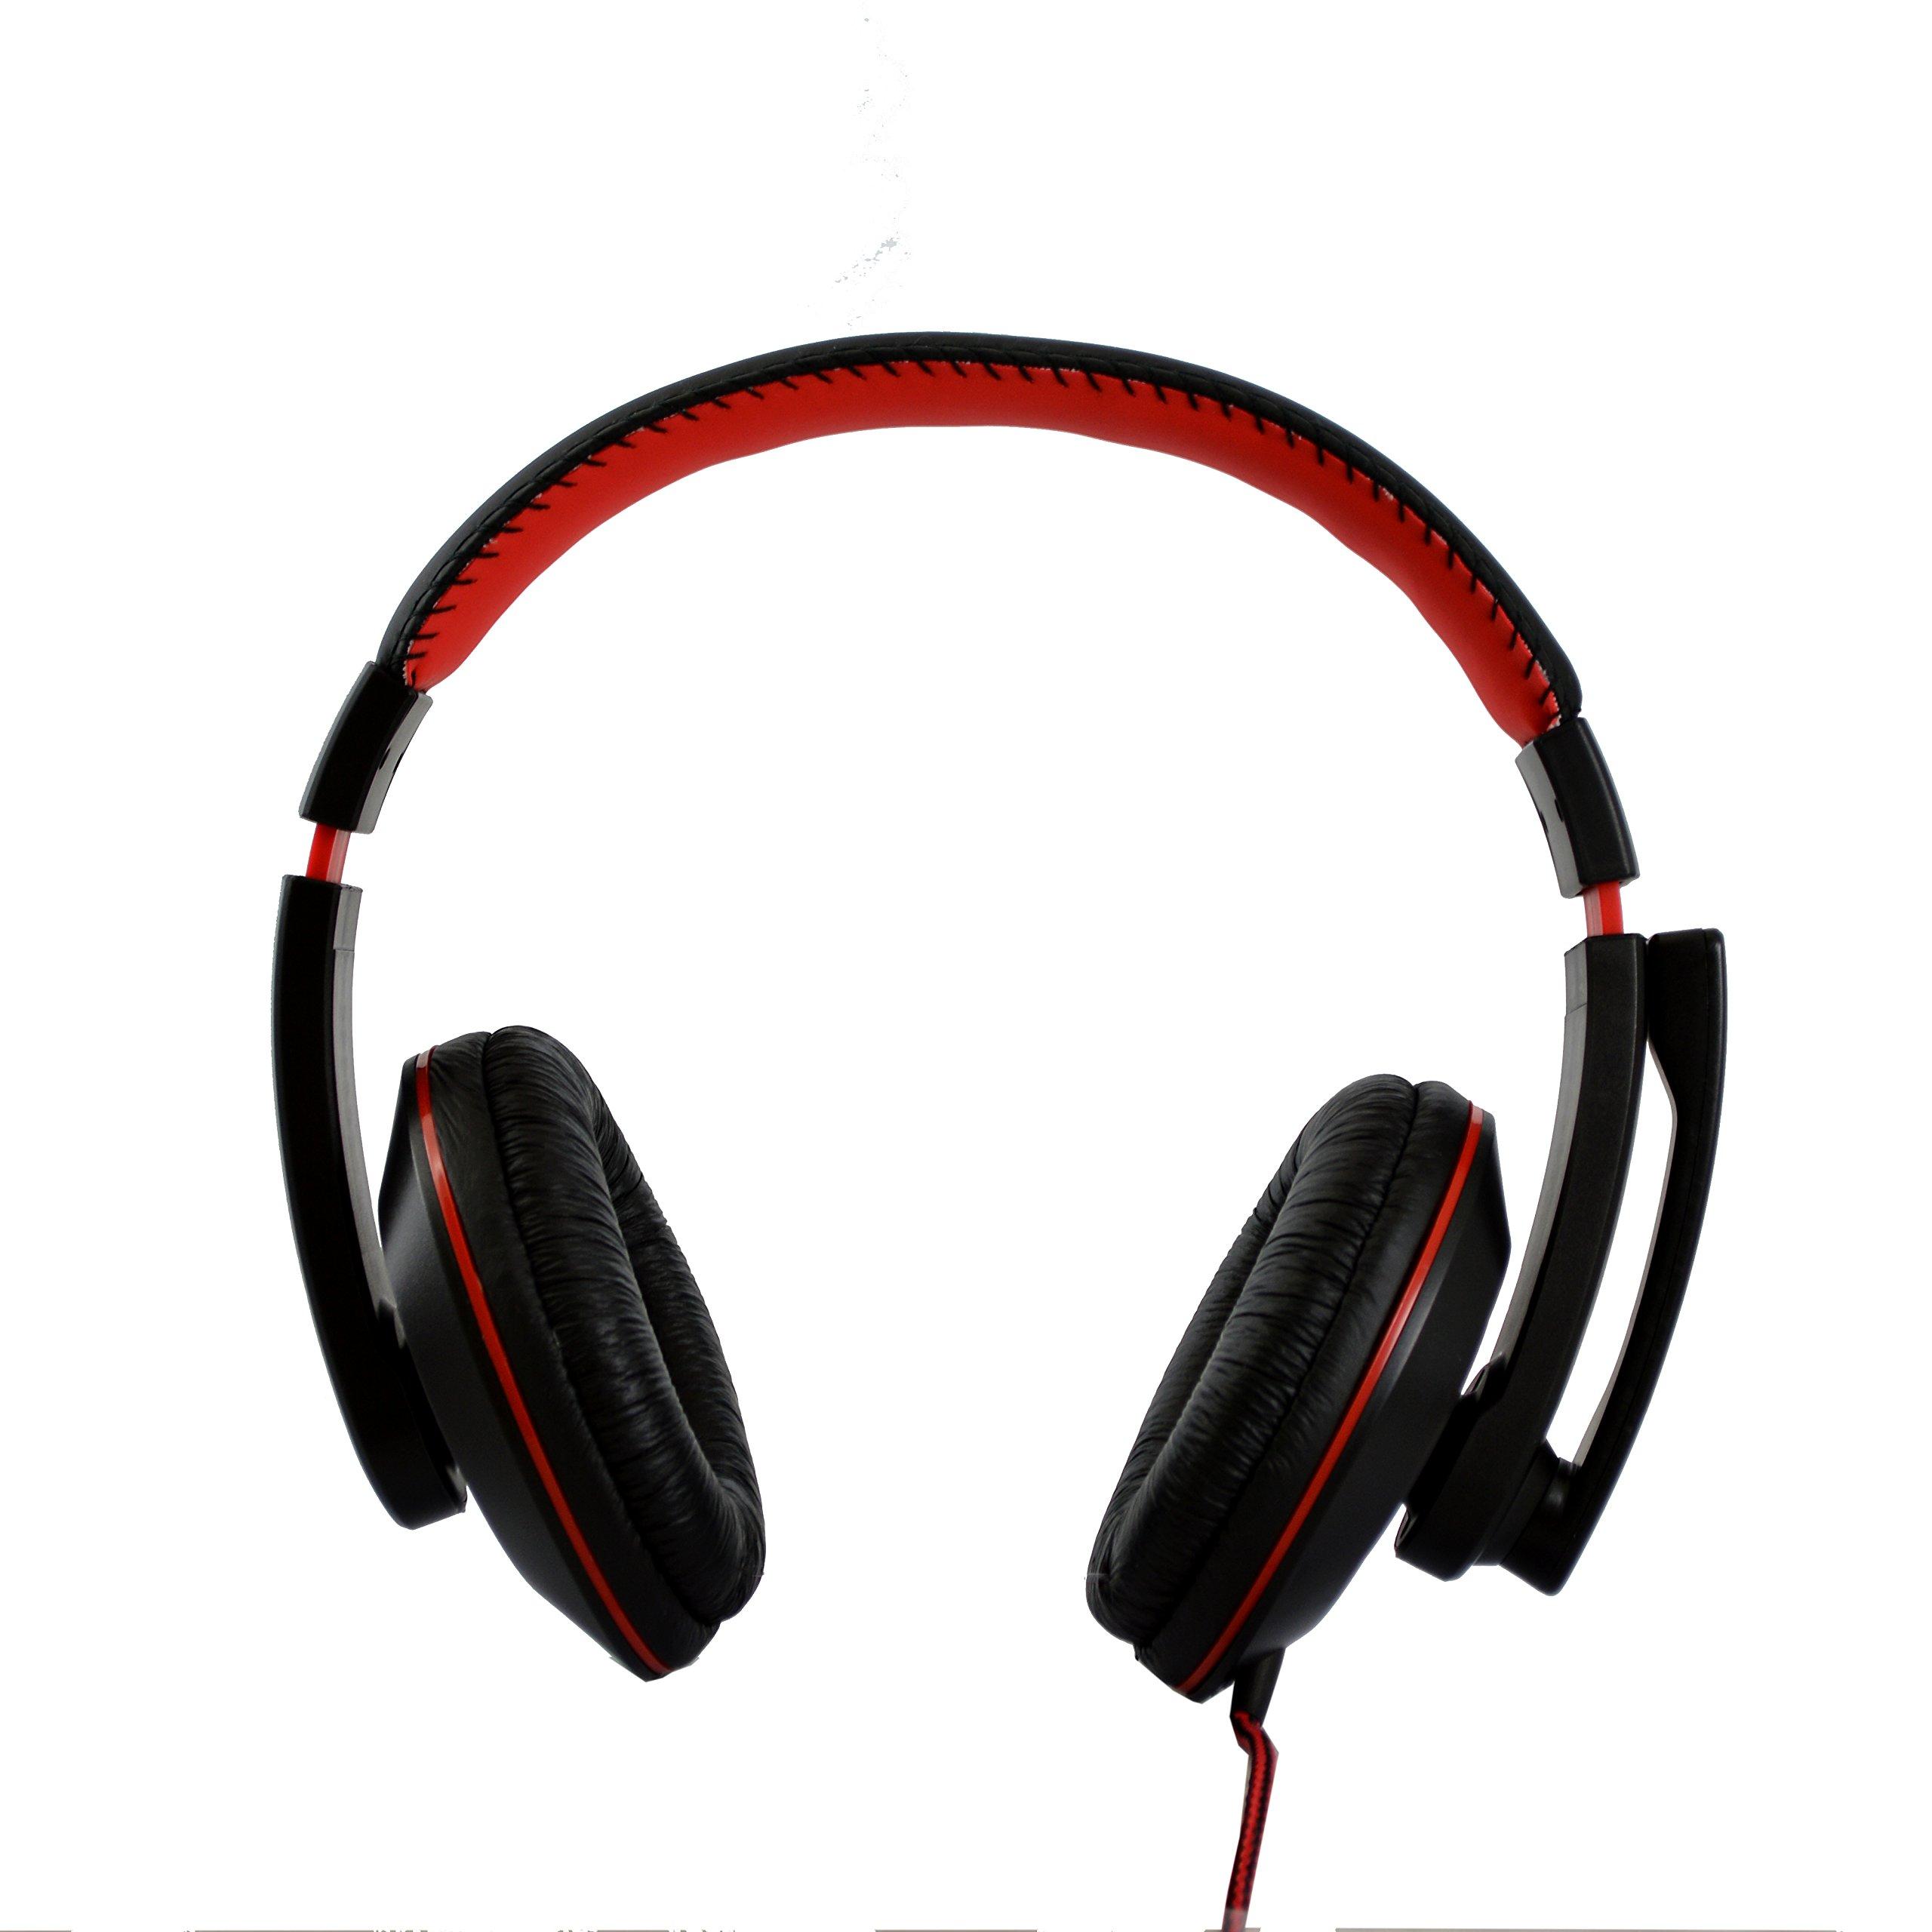 Viotek Vt849 Headphone - Stereo - Mini-phone - Wired - 32 Ohm - 20 Hz 20 Khz - Over-the-head - Binaural - Circumaural (154659)